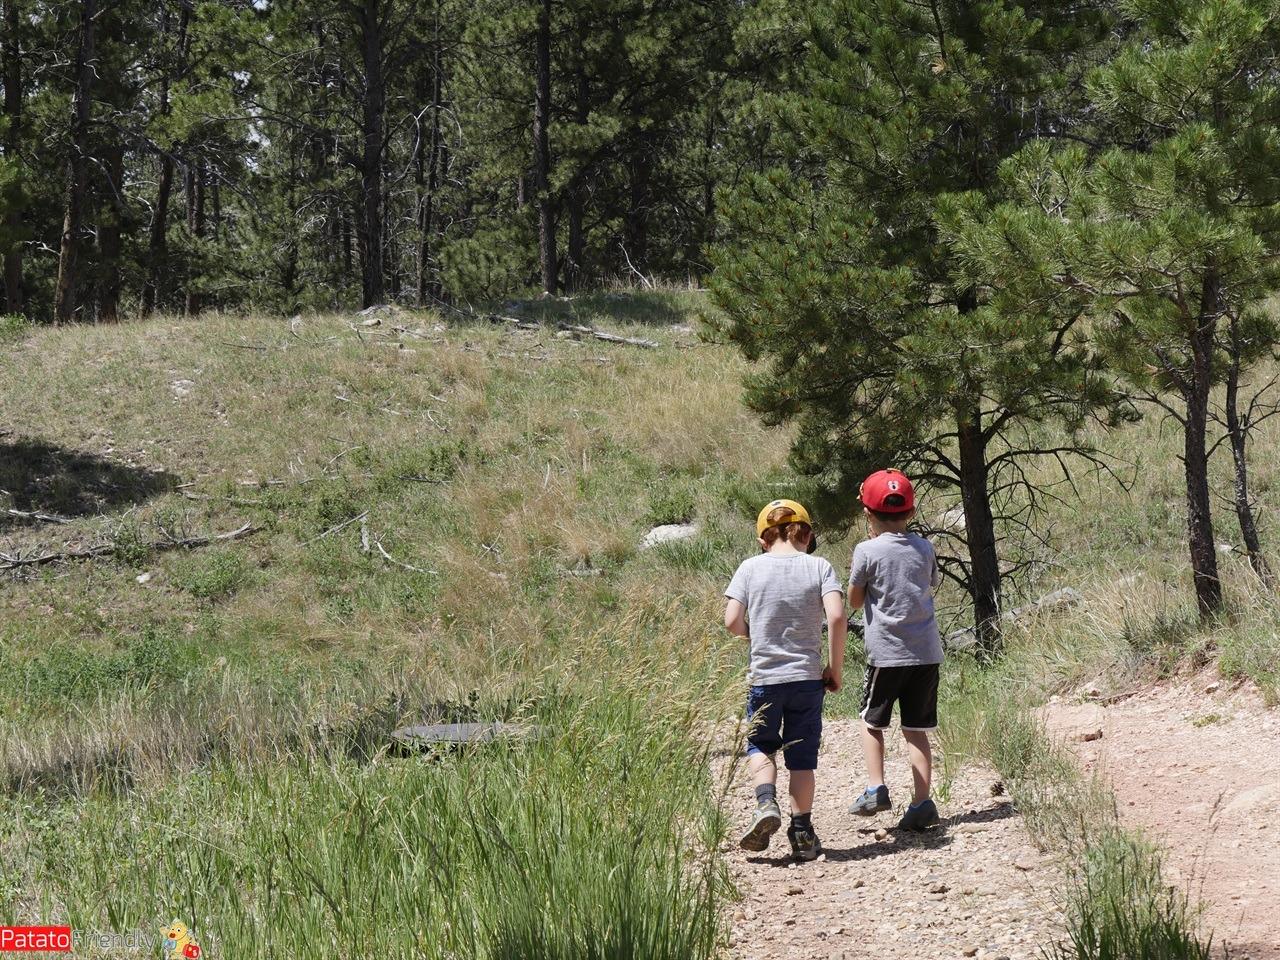 [cml_media_alt id='11551']Viaggio in South Dakota trekking[/cml_media_alt]